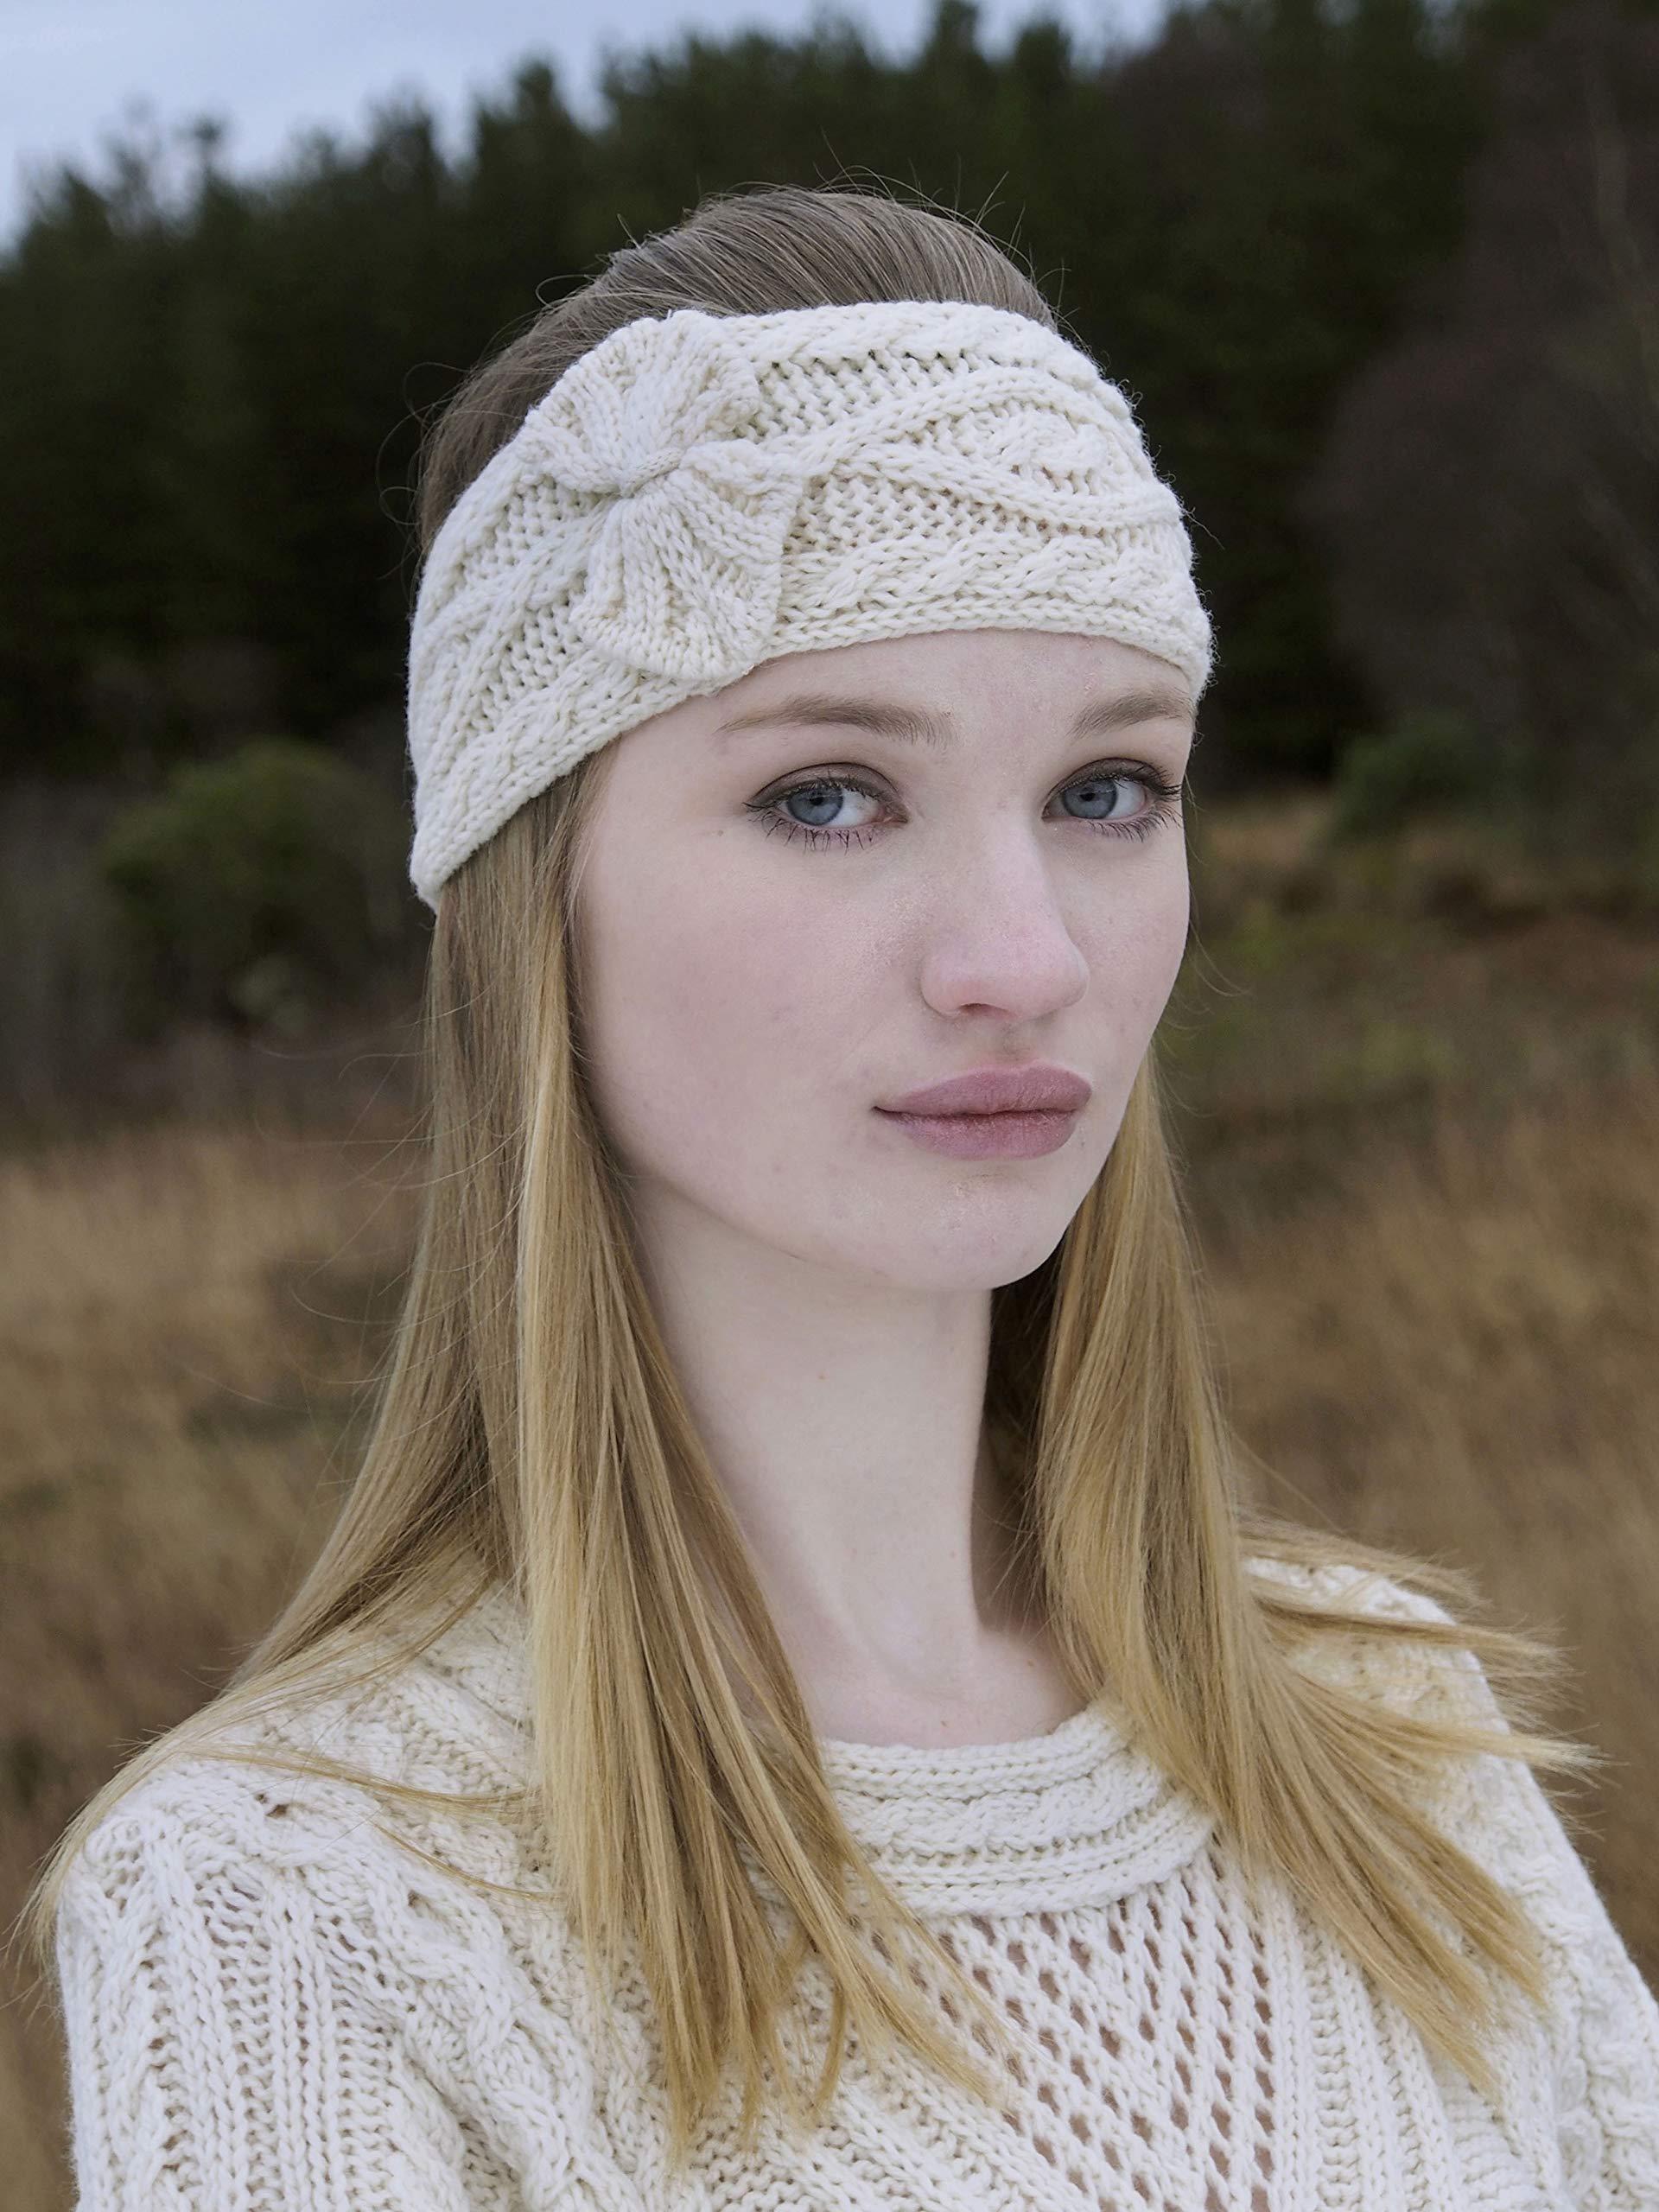 Aran Crafts Headband (100% Merino Wool) One Size Natural (X4341-NAT) by Aran Crafts Ireland (Image #3)